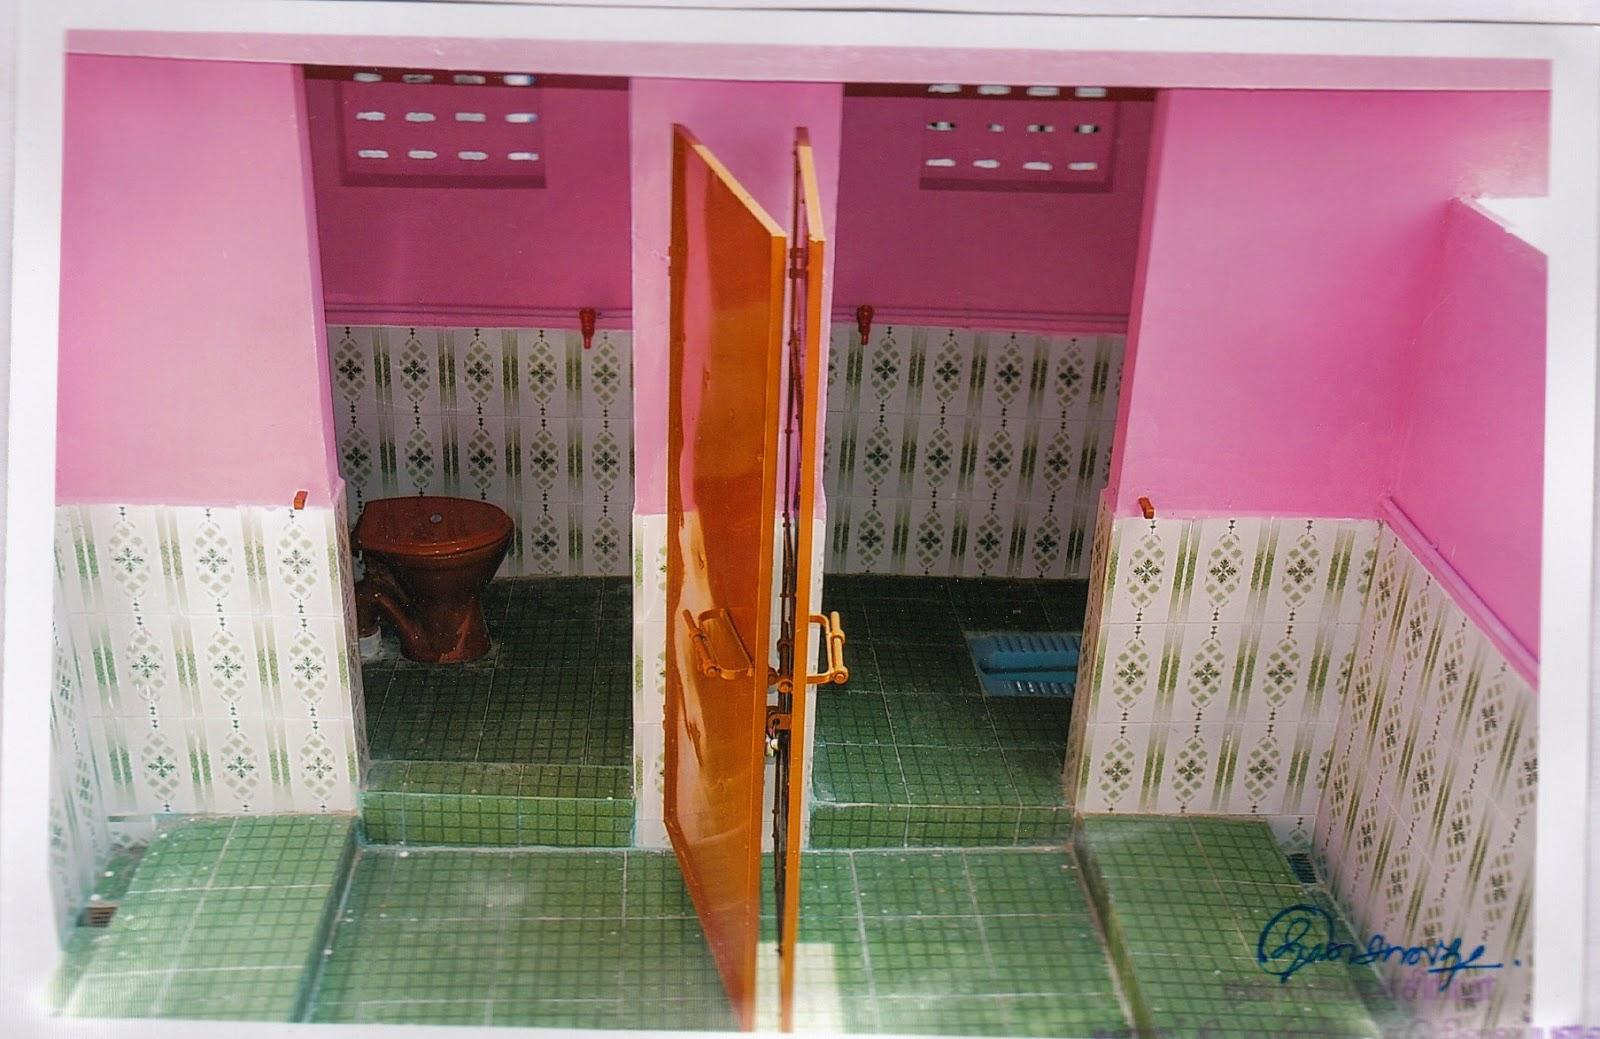 SWACHH VIDYALAYA TAMILNADU: SSA VELLORE DISTRICT 2014-15 S GIRLS